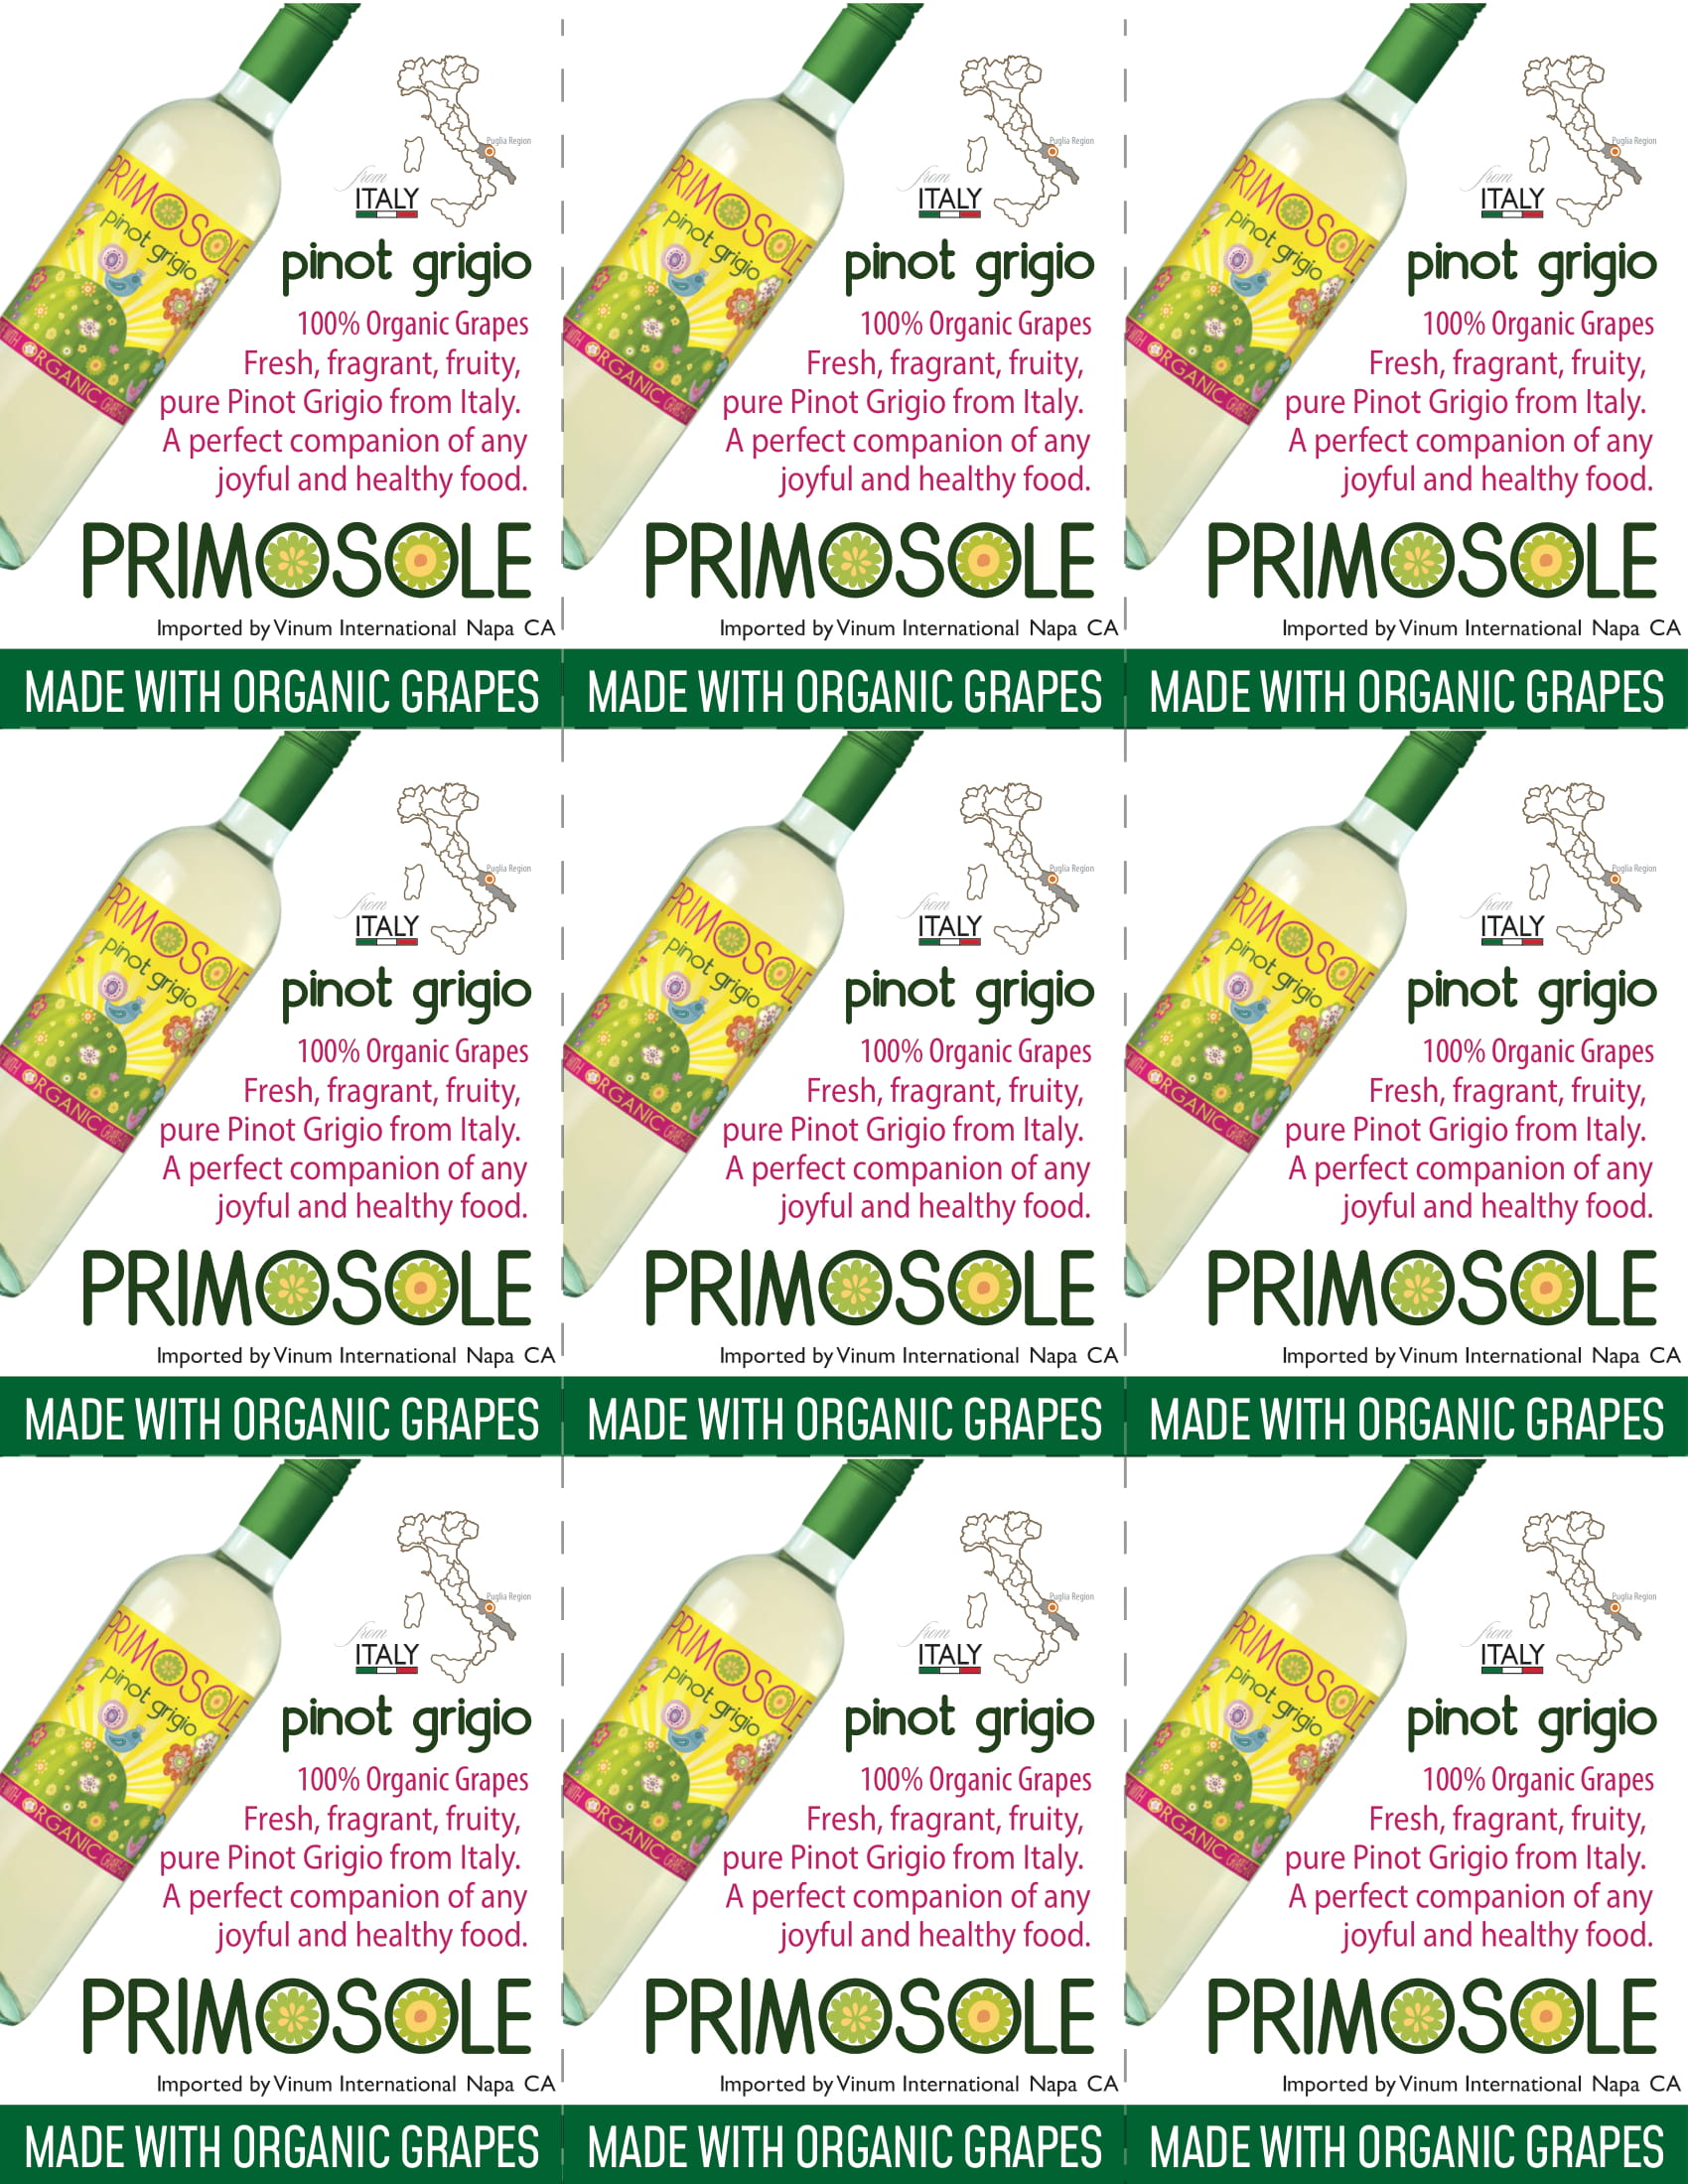 PrimoSole Pinot Grigio Shelf Talker